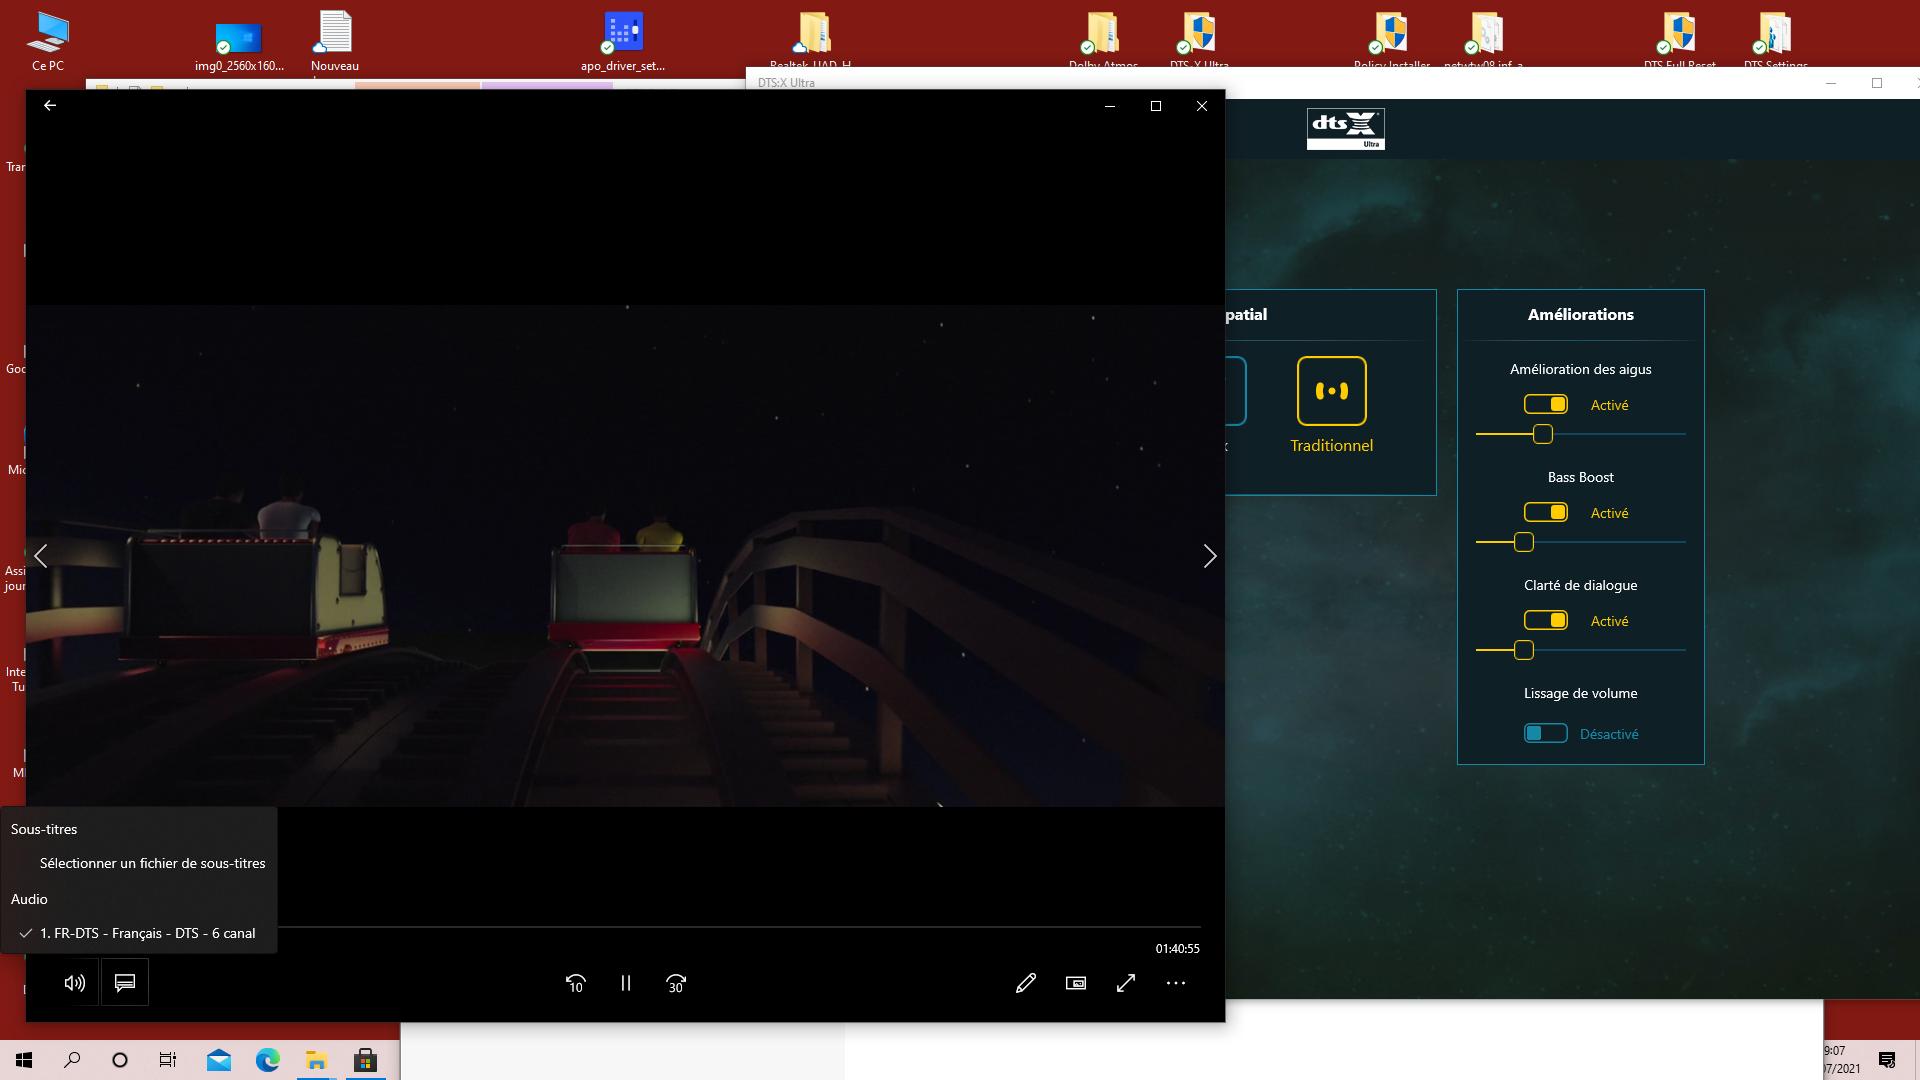 Desktop Screenshot 2021.07.23 - 19.07.45.13.png